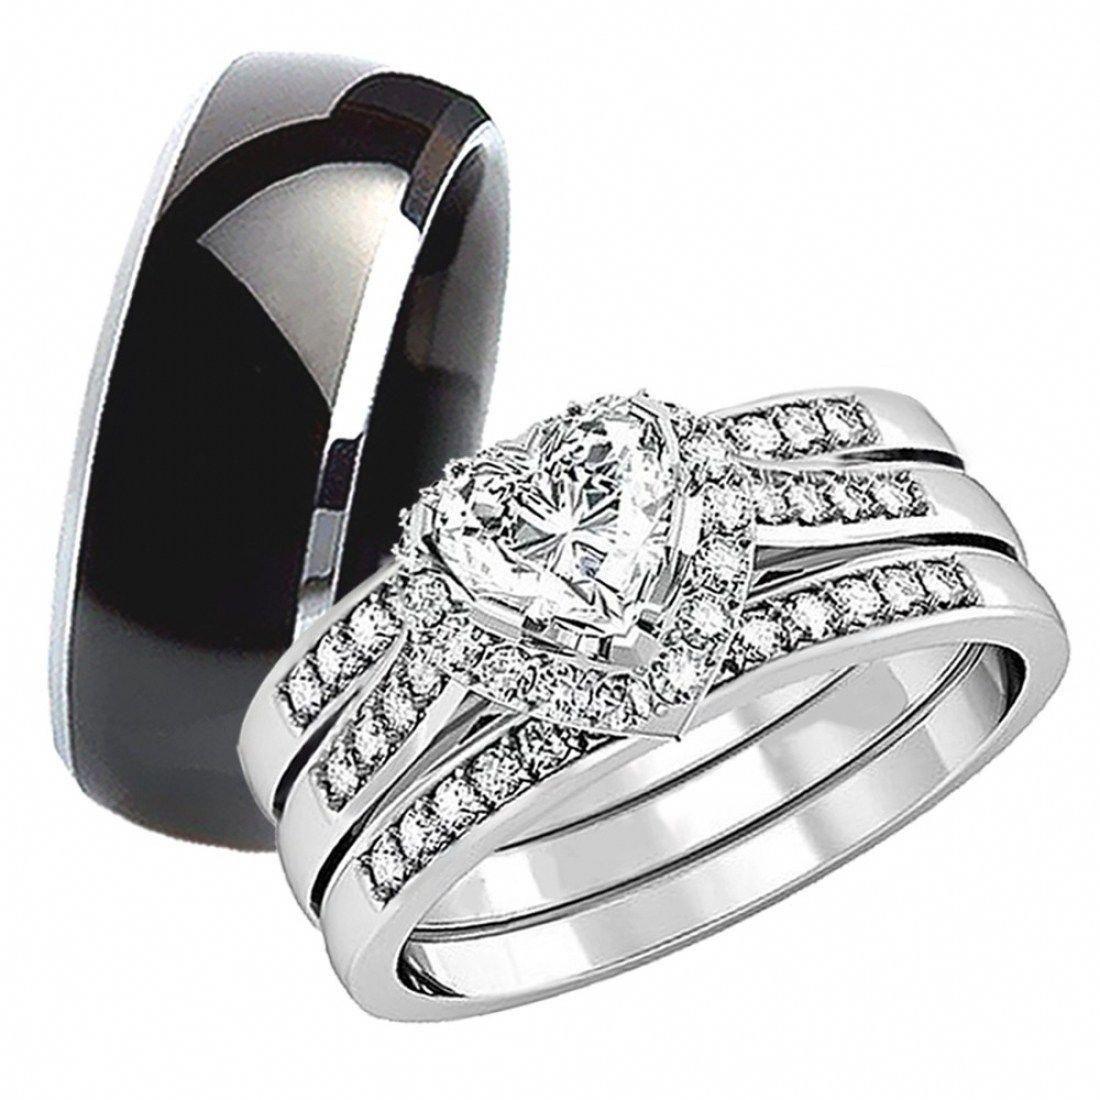 Impressive thing hisandhersweddingrings Wedding rings